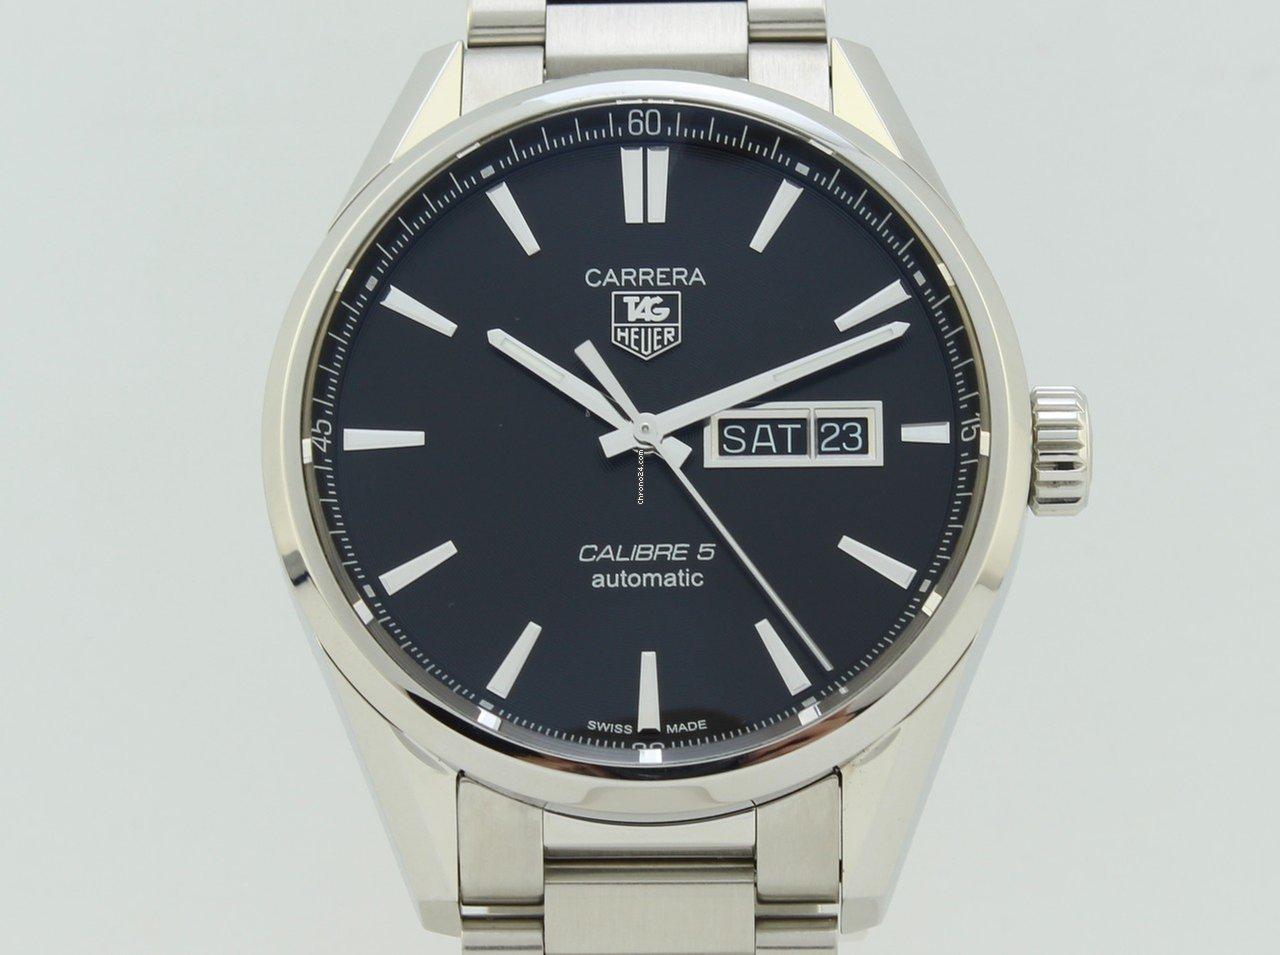 3c9d982a73e Relojes TAG Heuer Carrera de segunda mano